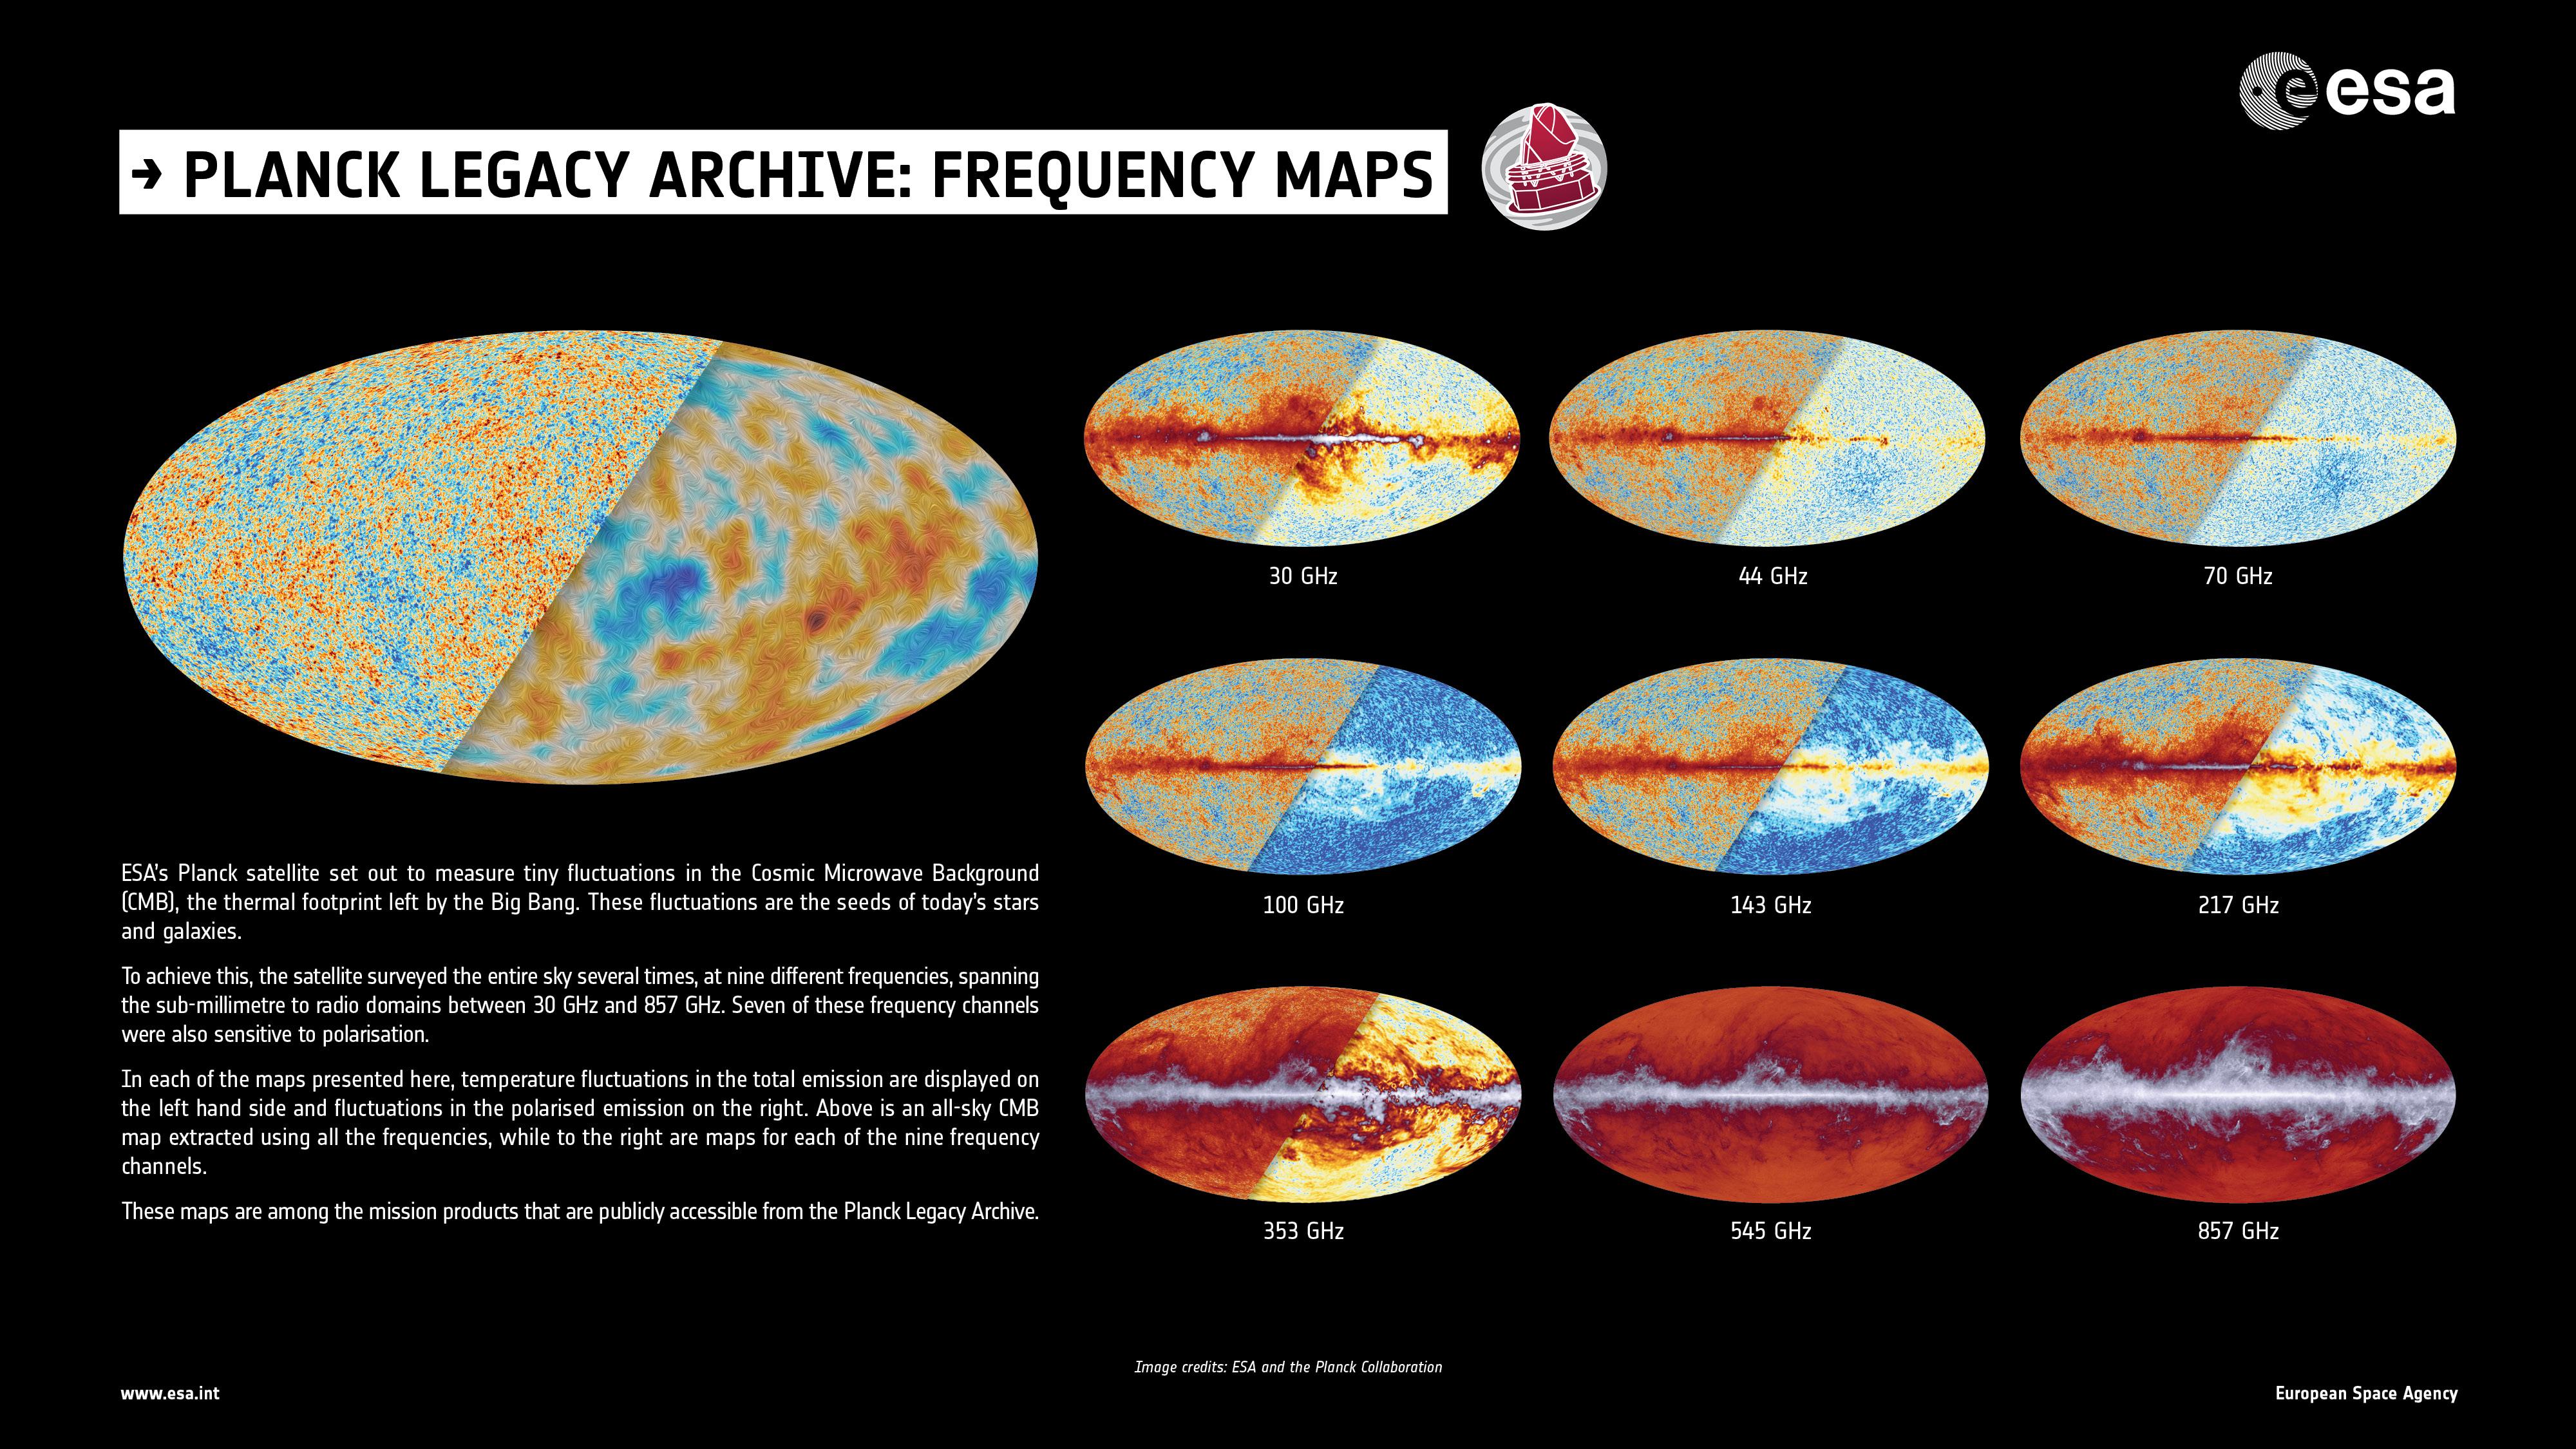 1567215877486-Planck_LegacyArchive_FrequencyMaps.jpg